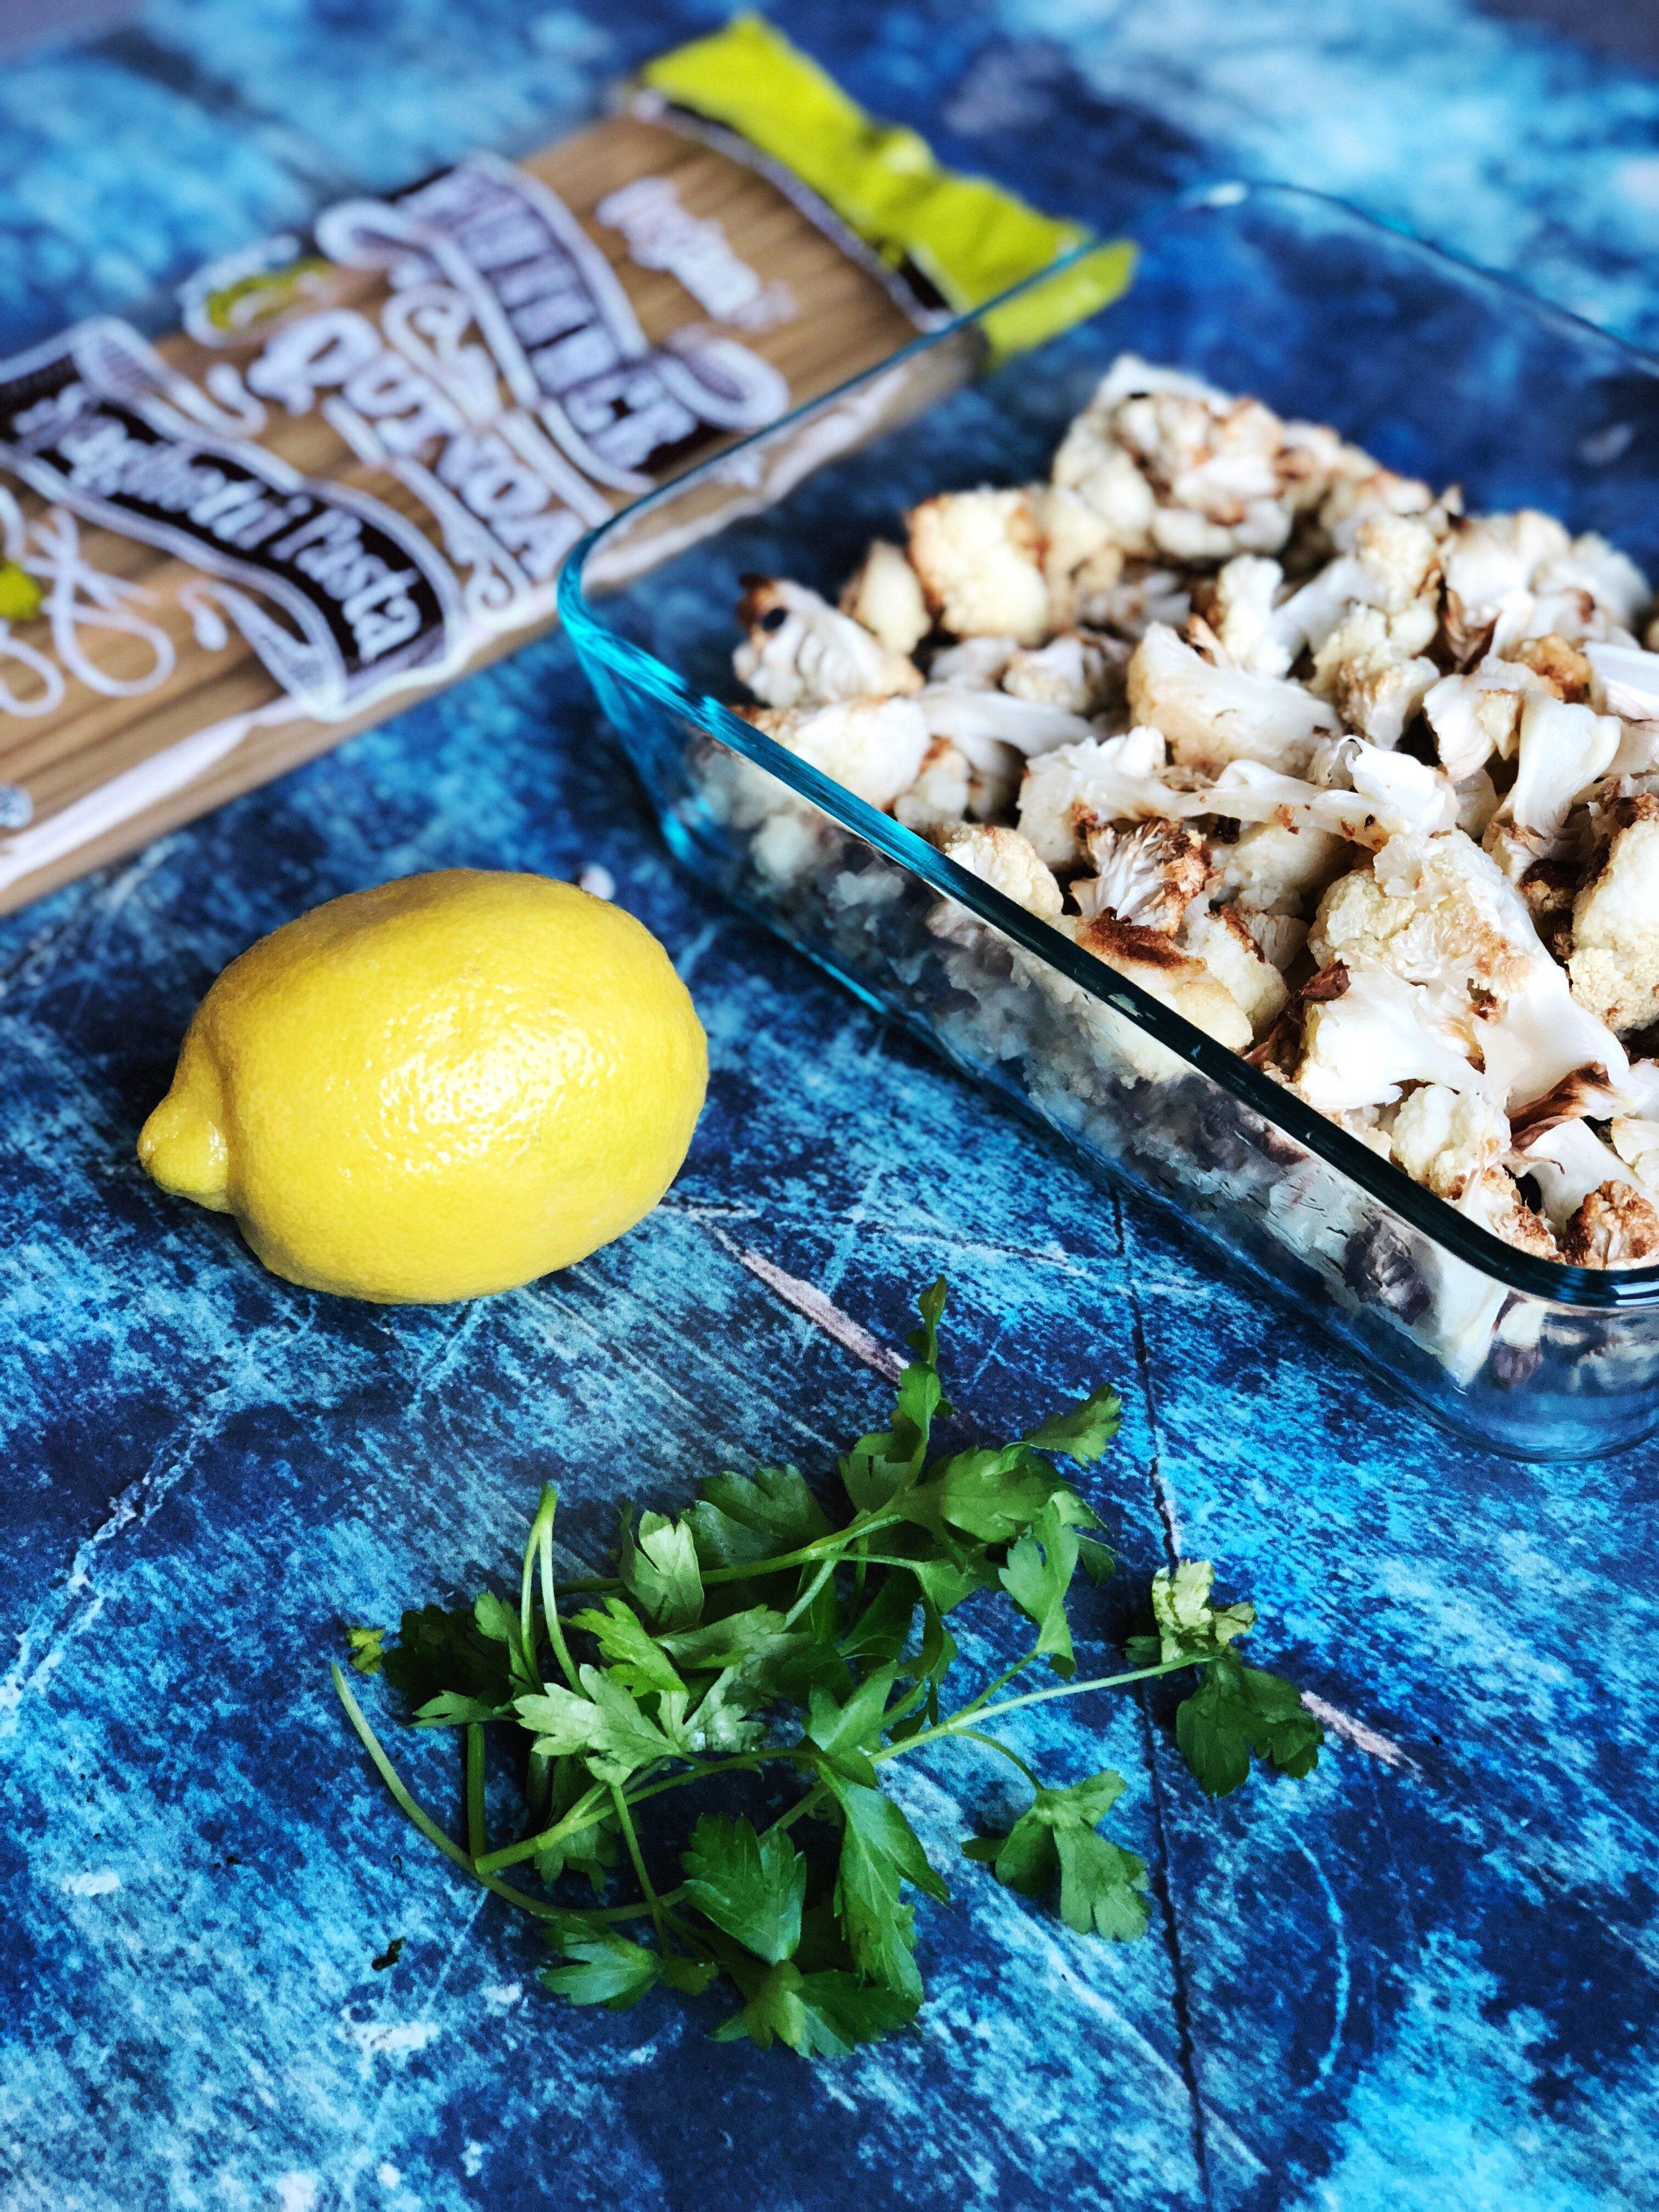 almonds and asana cauliflower alfredo prep.JPG